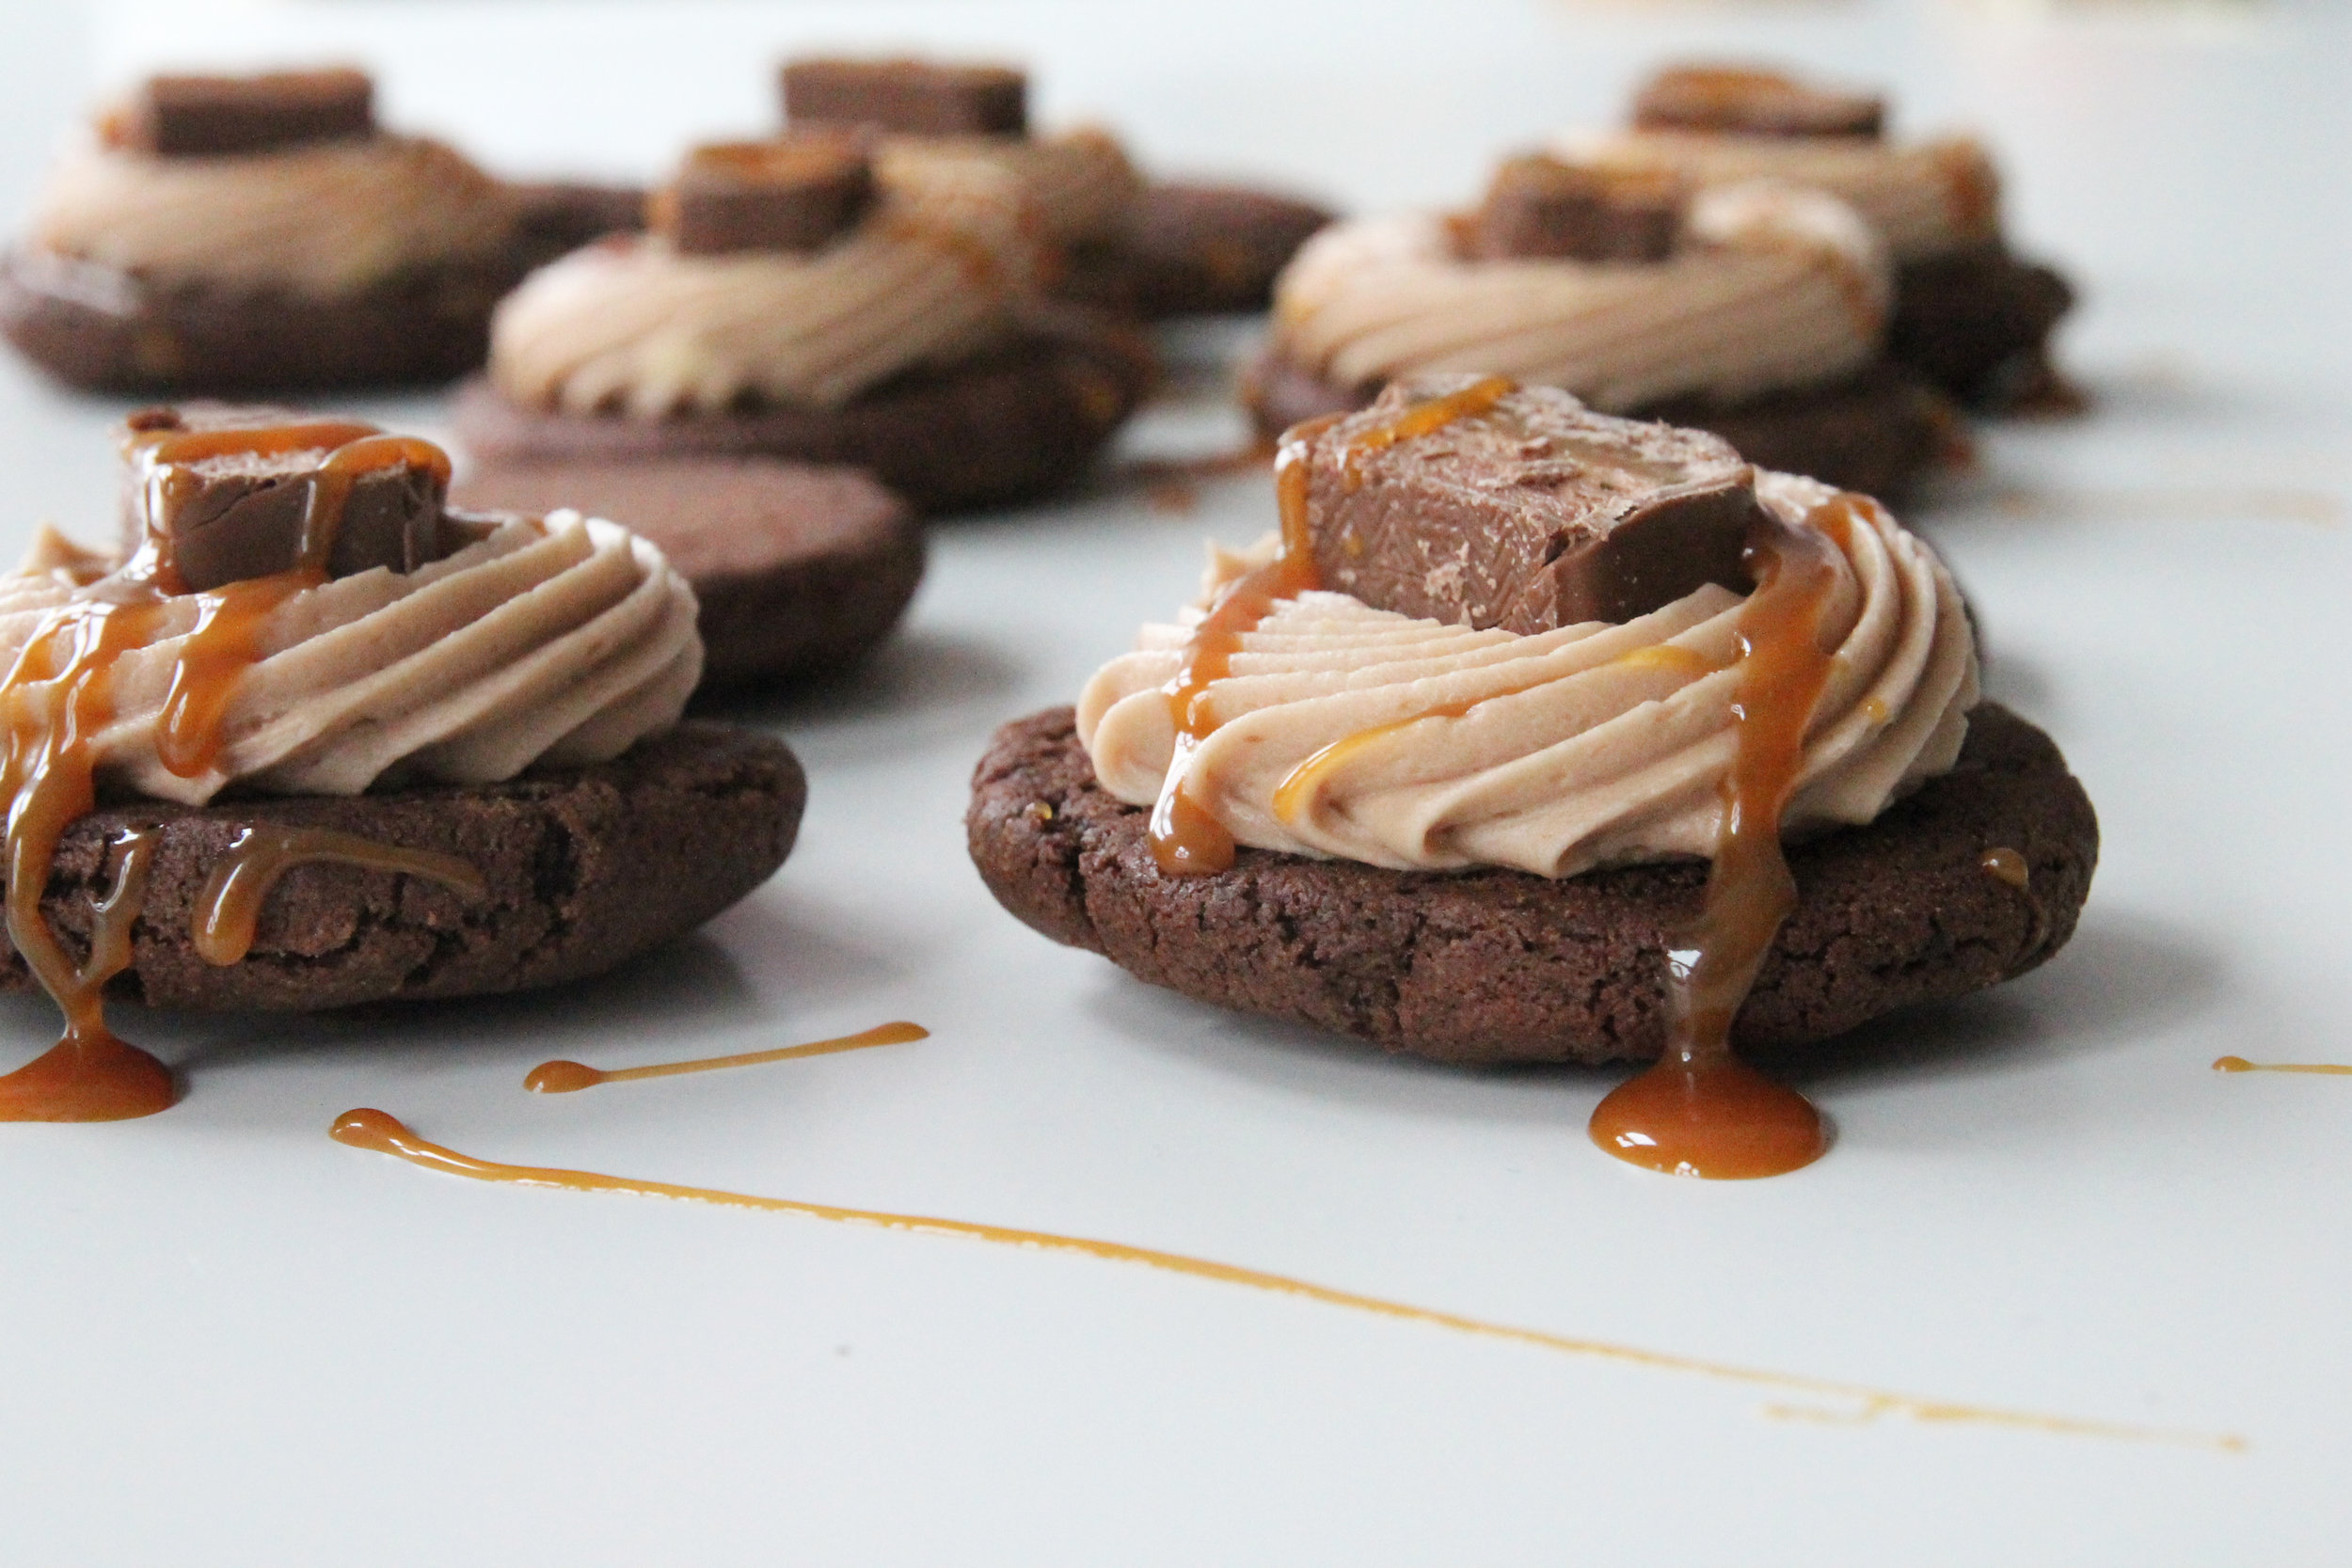 Vegan Dessert Ideas